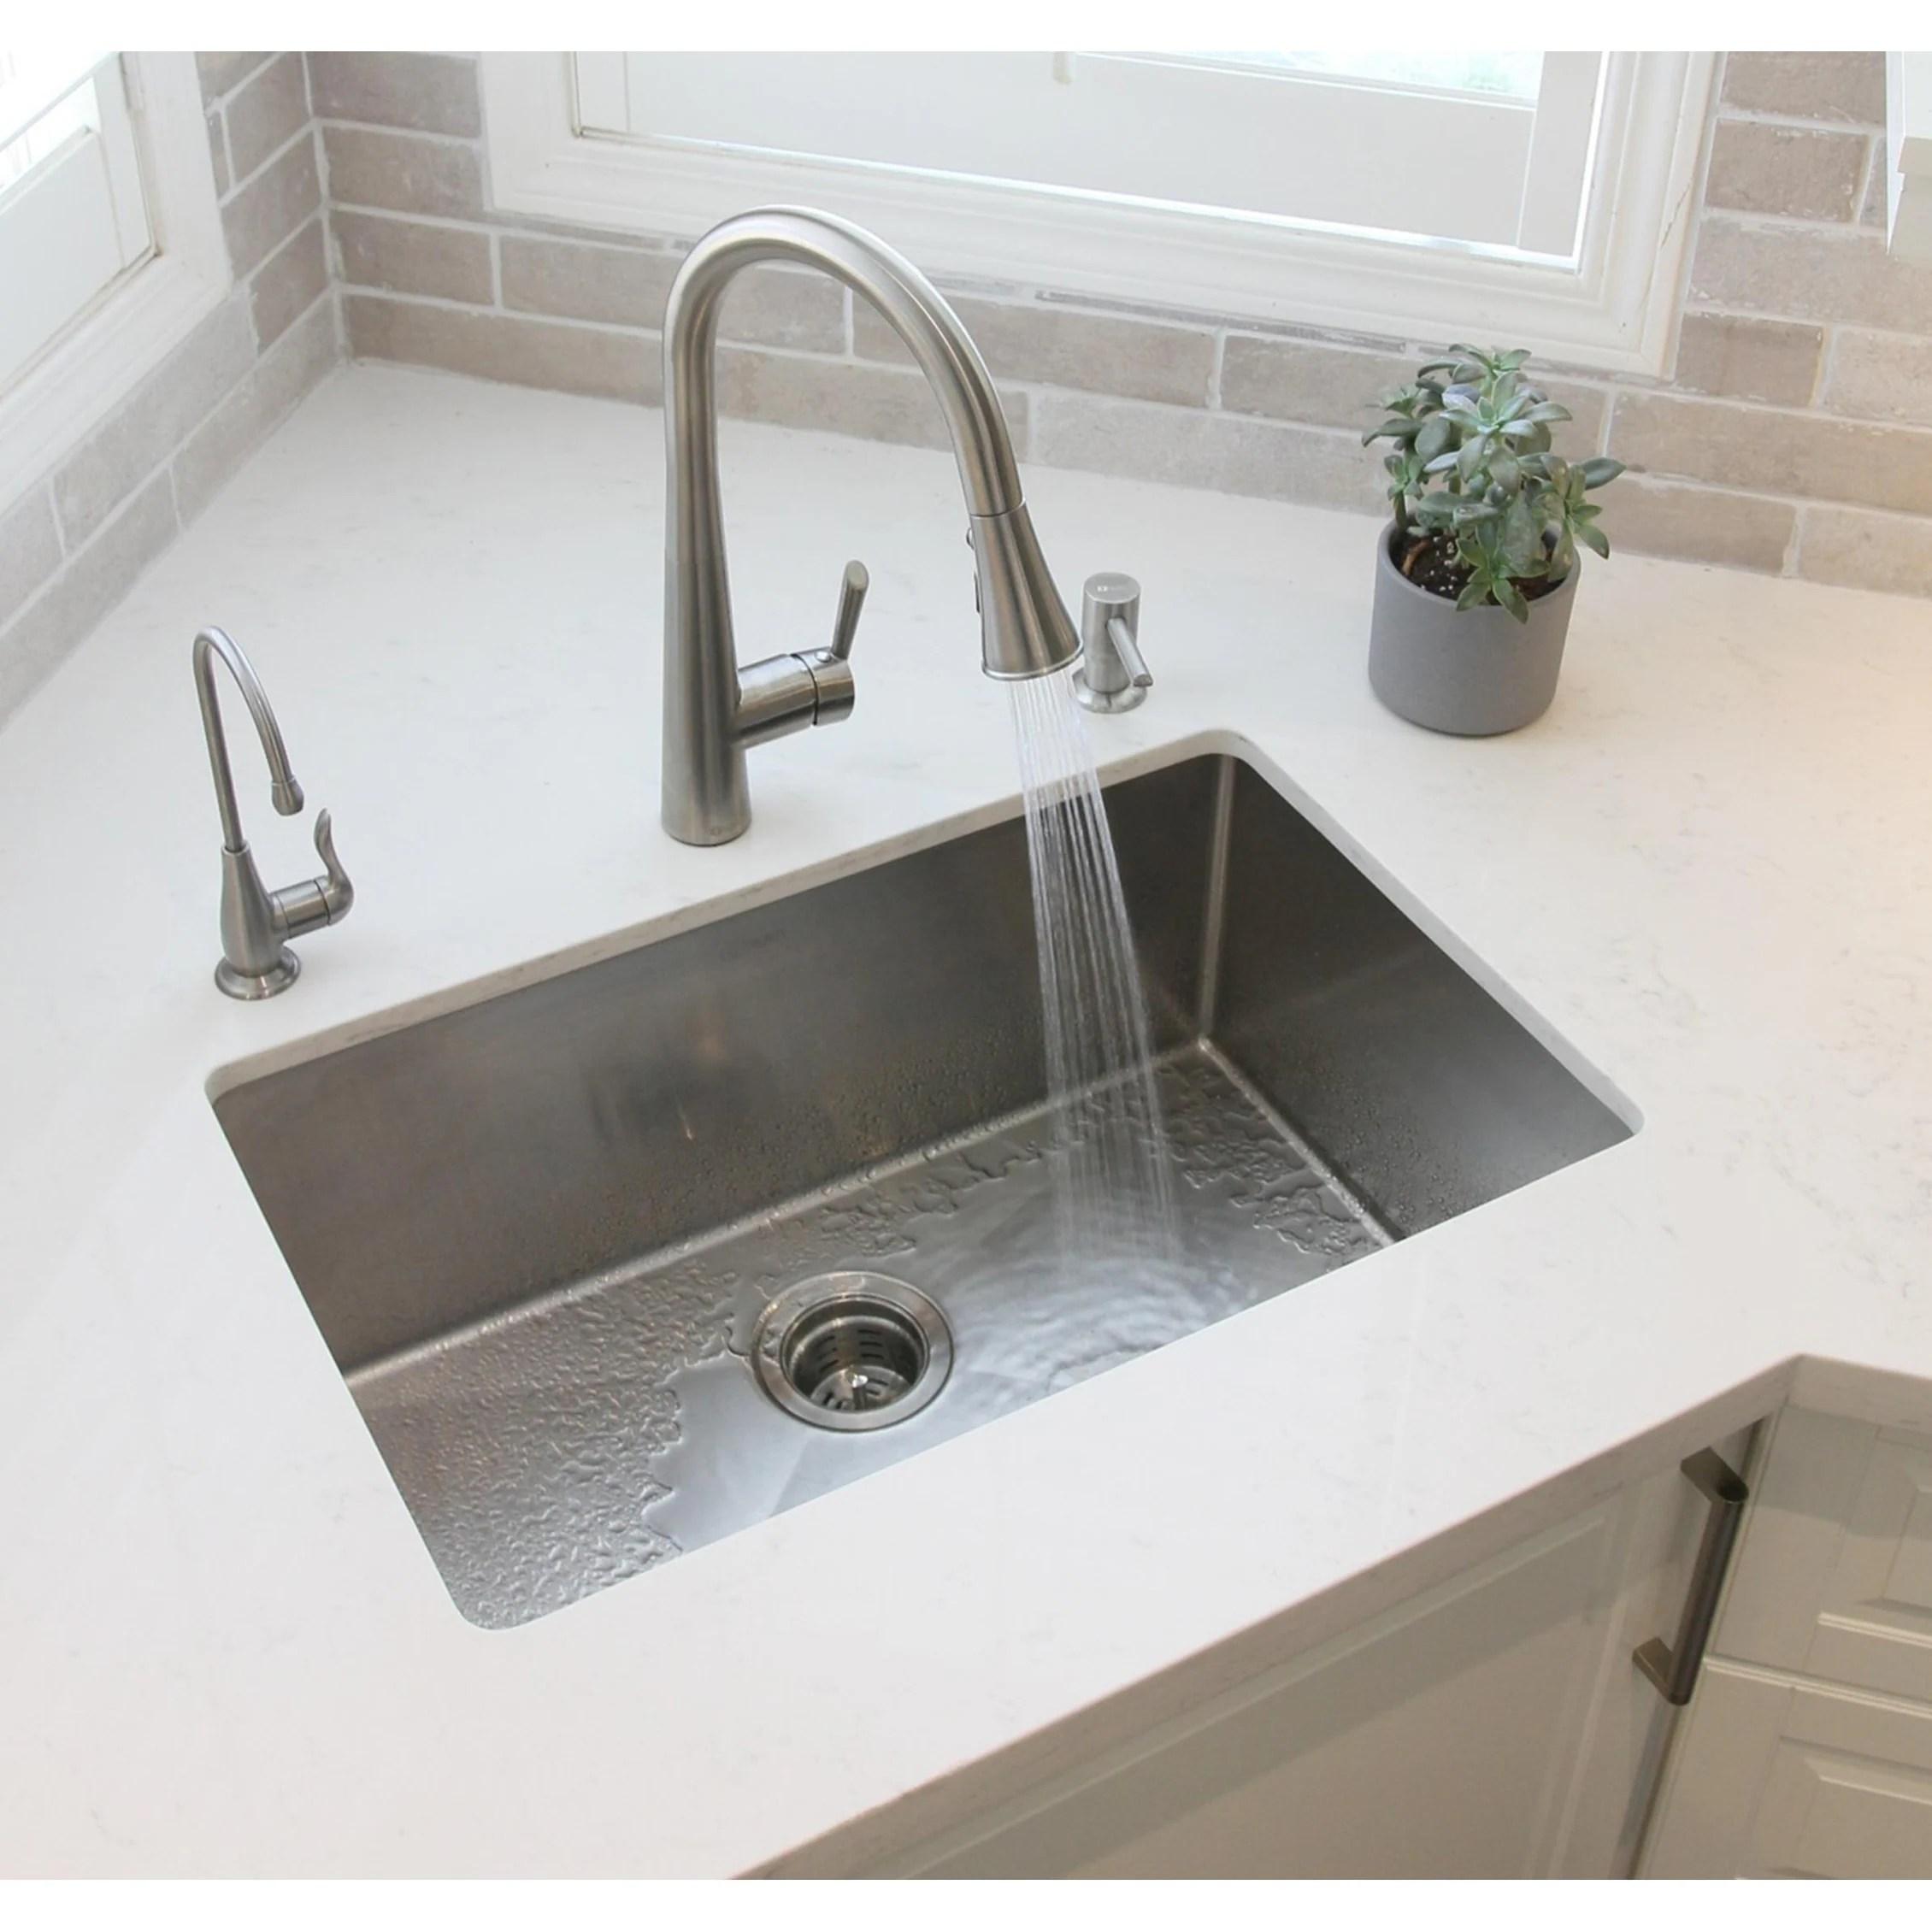 undermount single bowl kitchen sink cabinets discount shop 28 18g stainless steel s 306 x 18 10